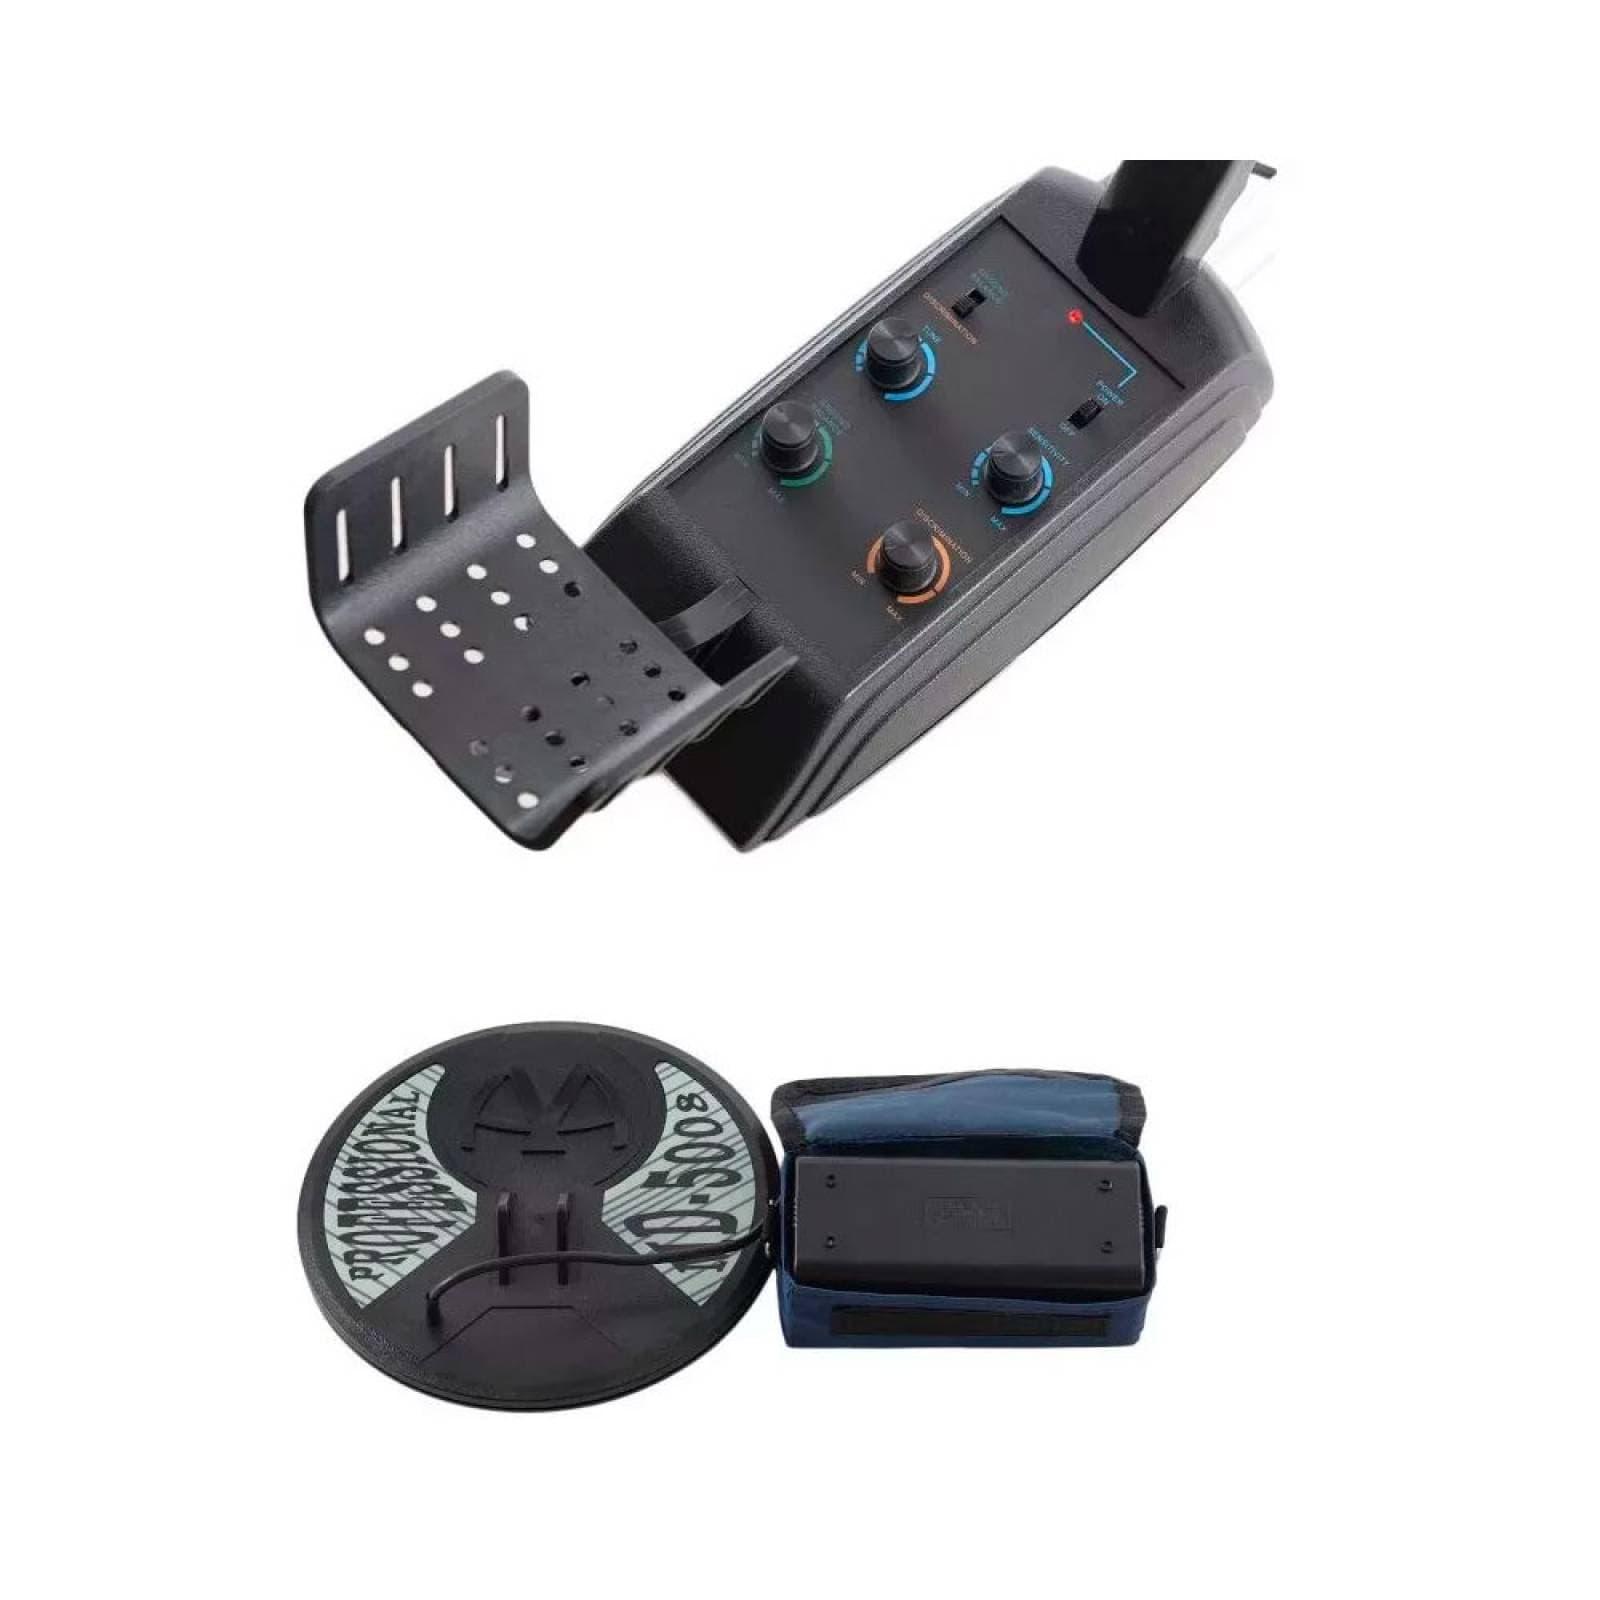 Detector Metales Tesoros 3.5m Profundidad Profesional Md5008